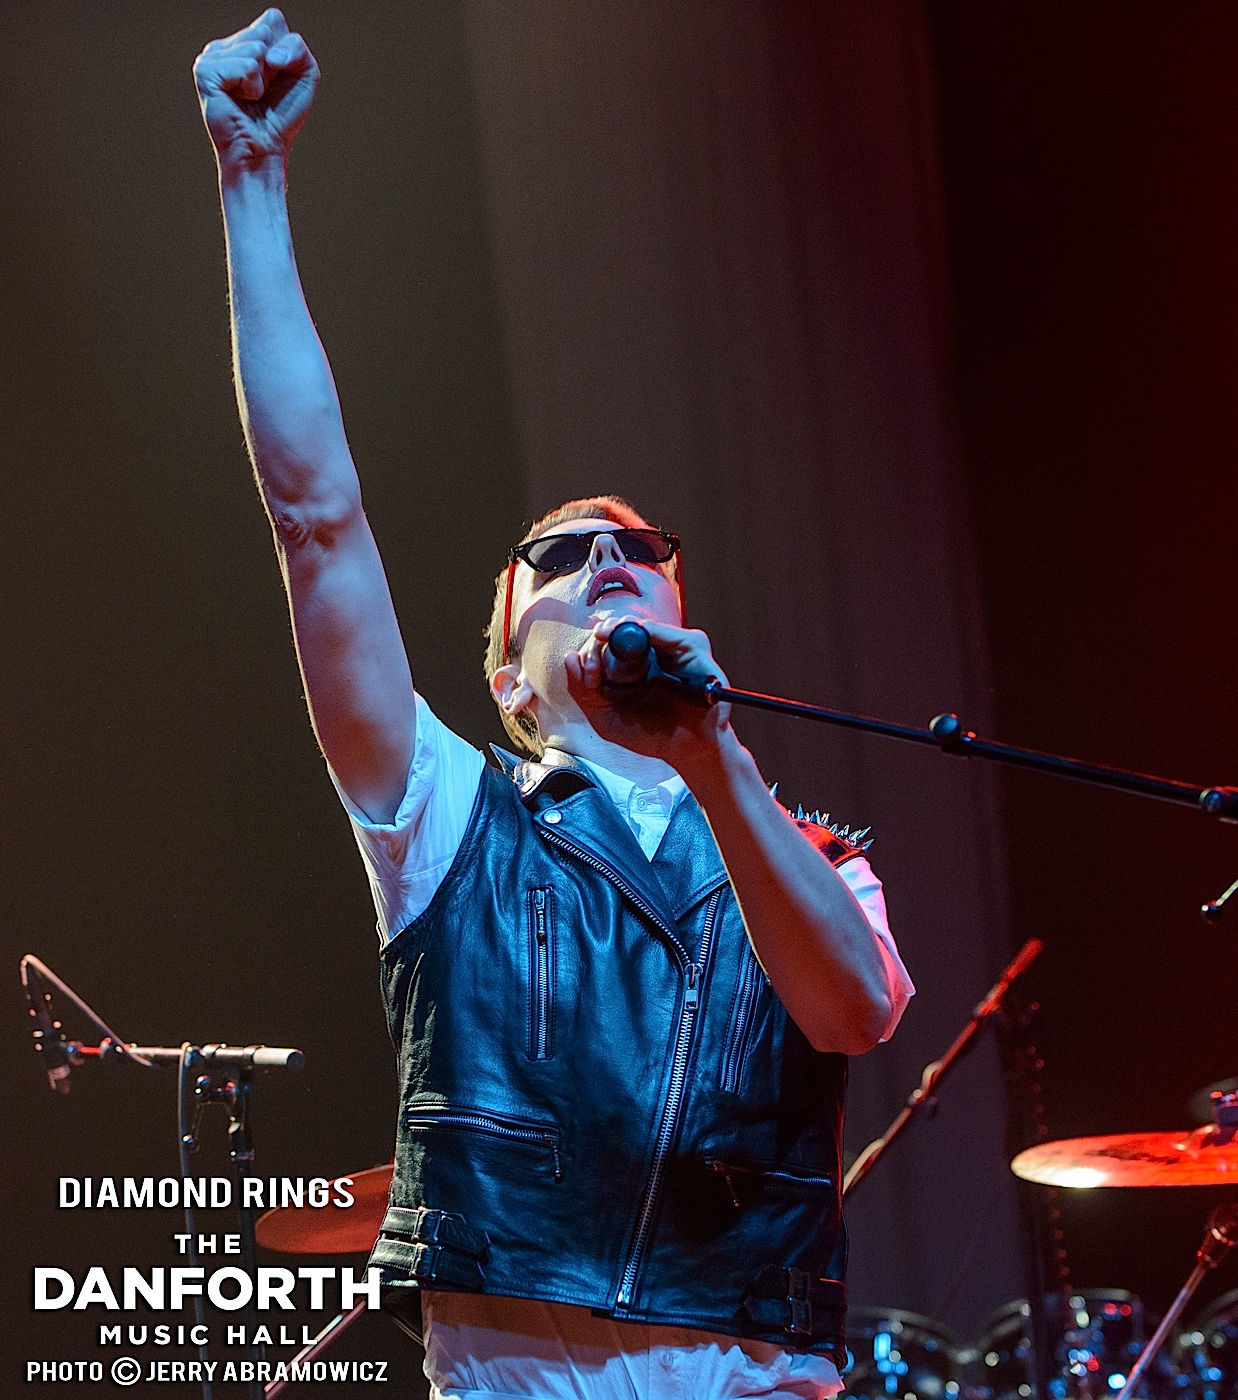 20130711 Diamond Rings at The Danforth Music Hall 0092